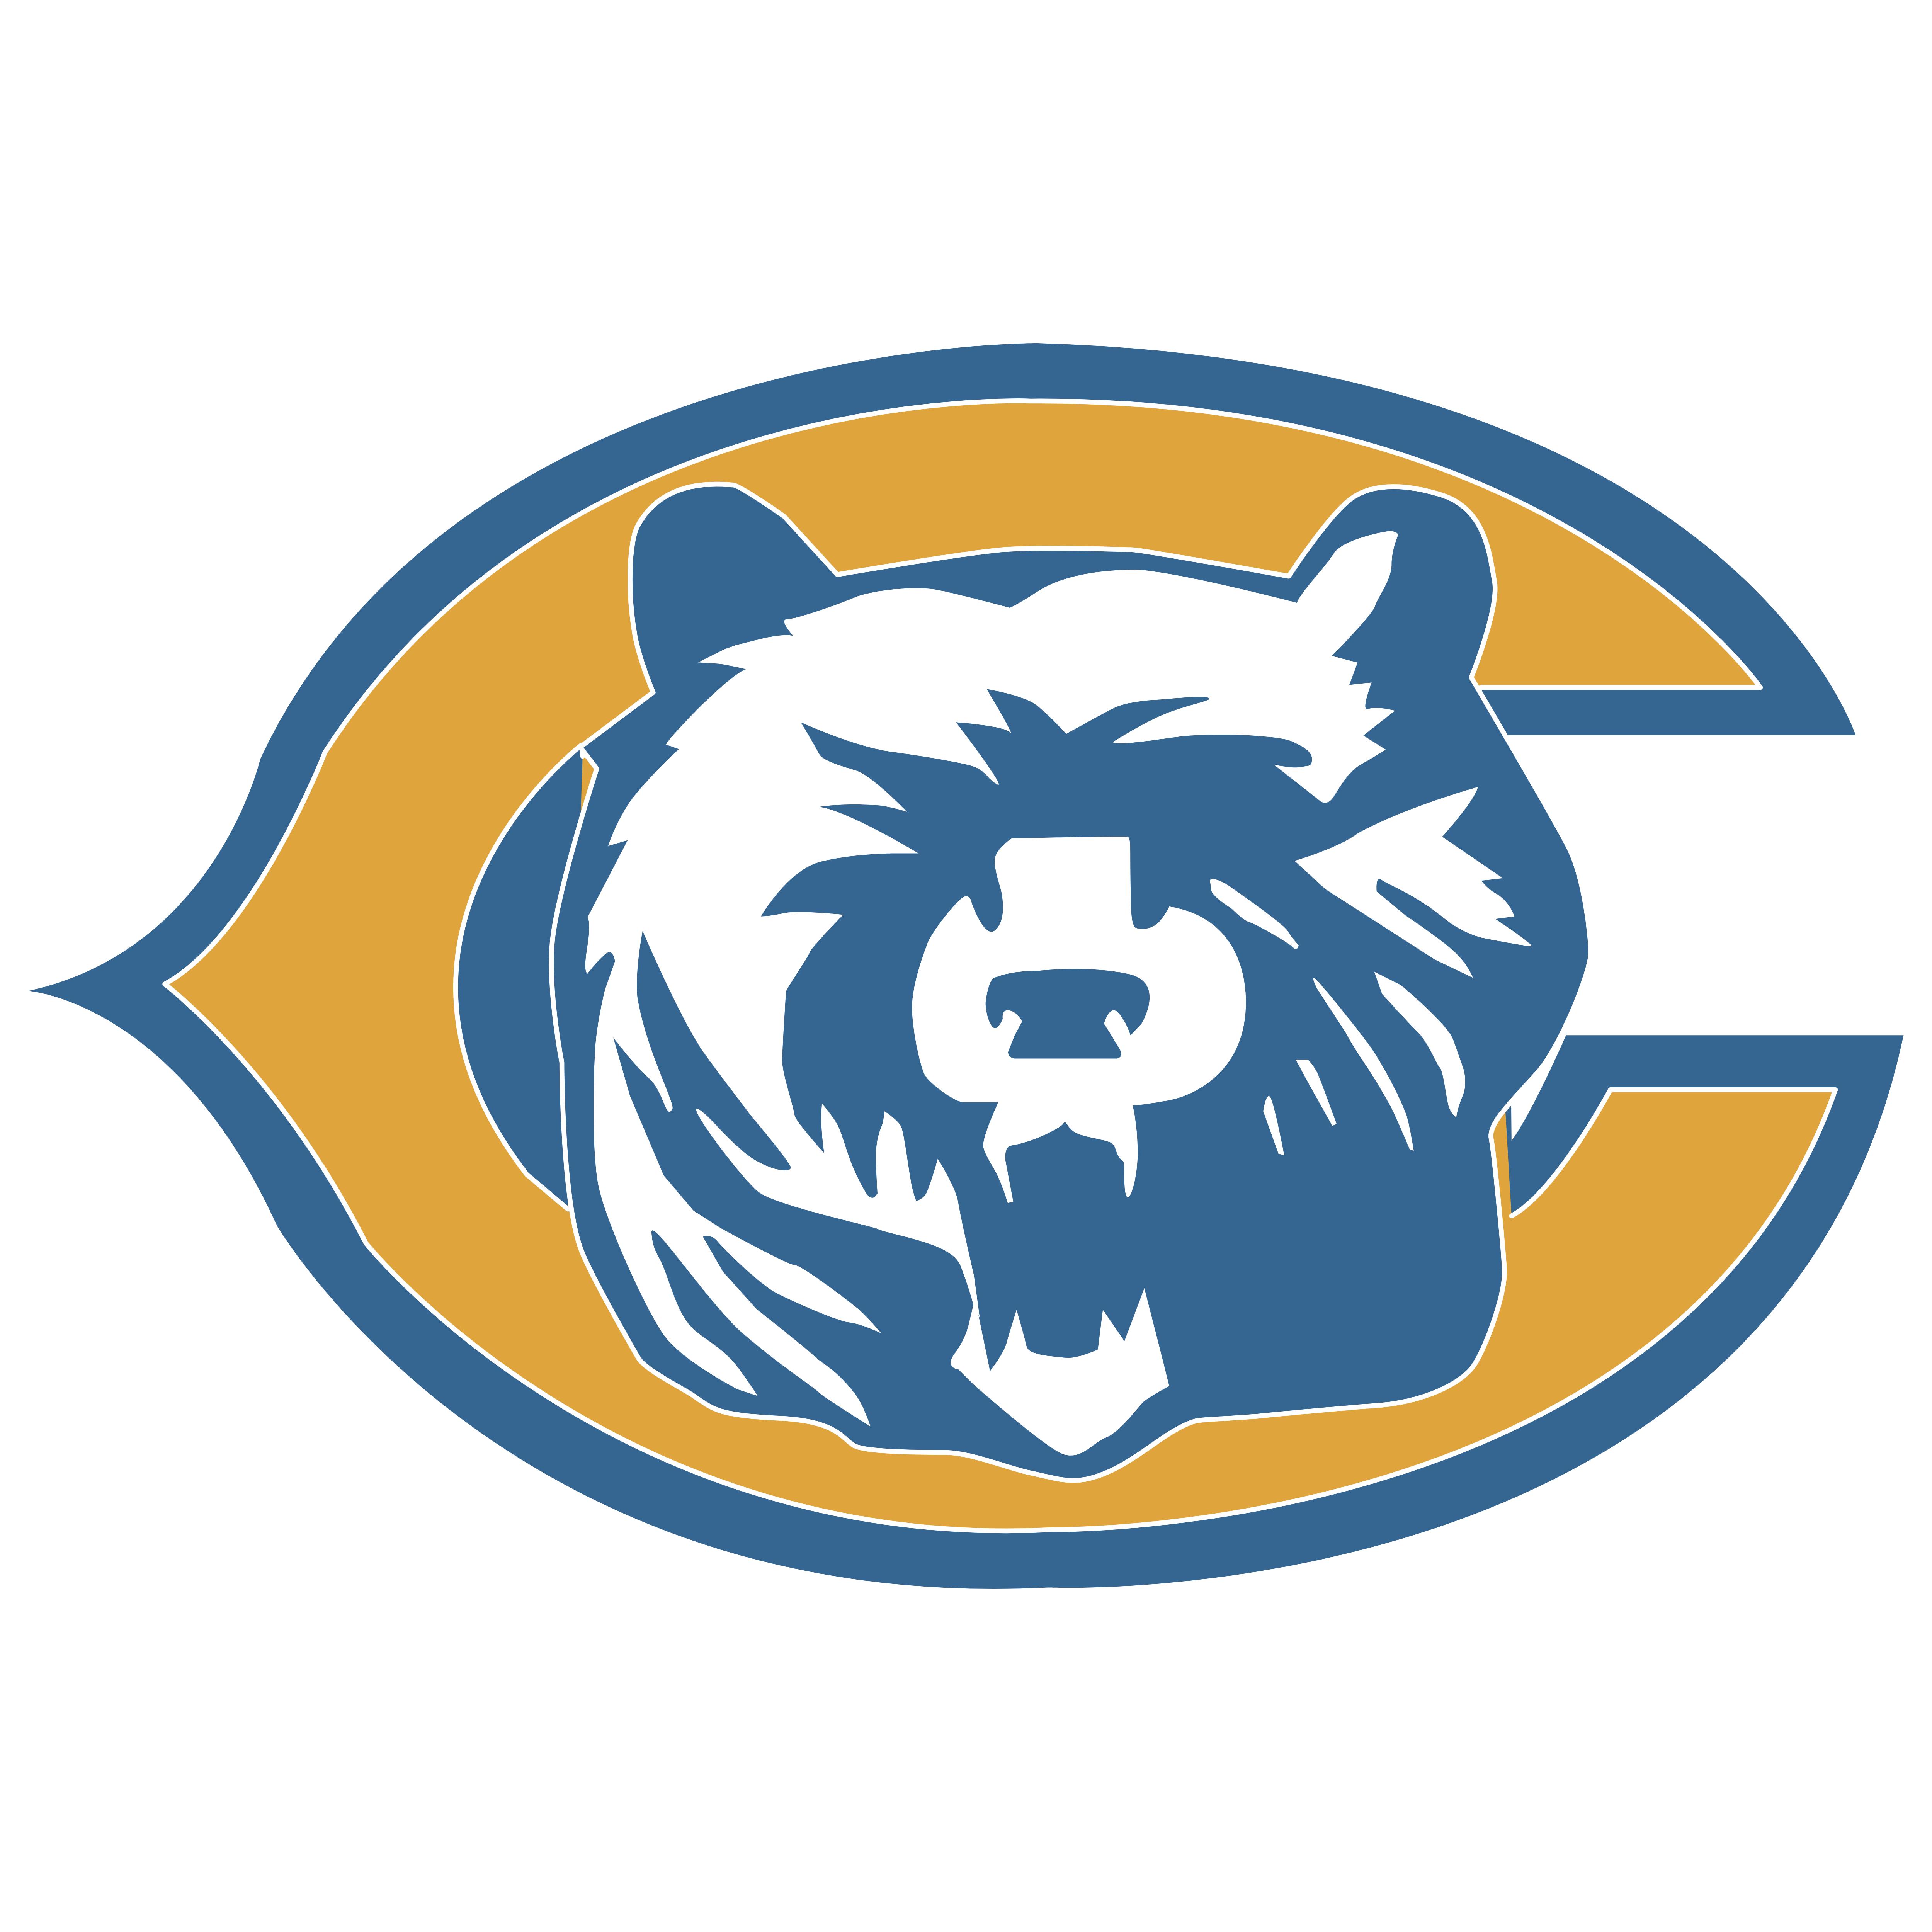 Chicago Bears.